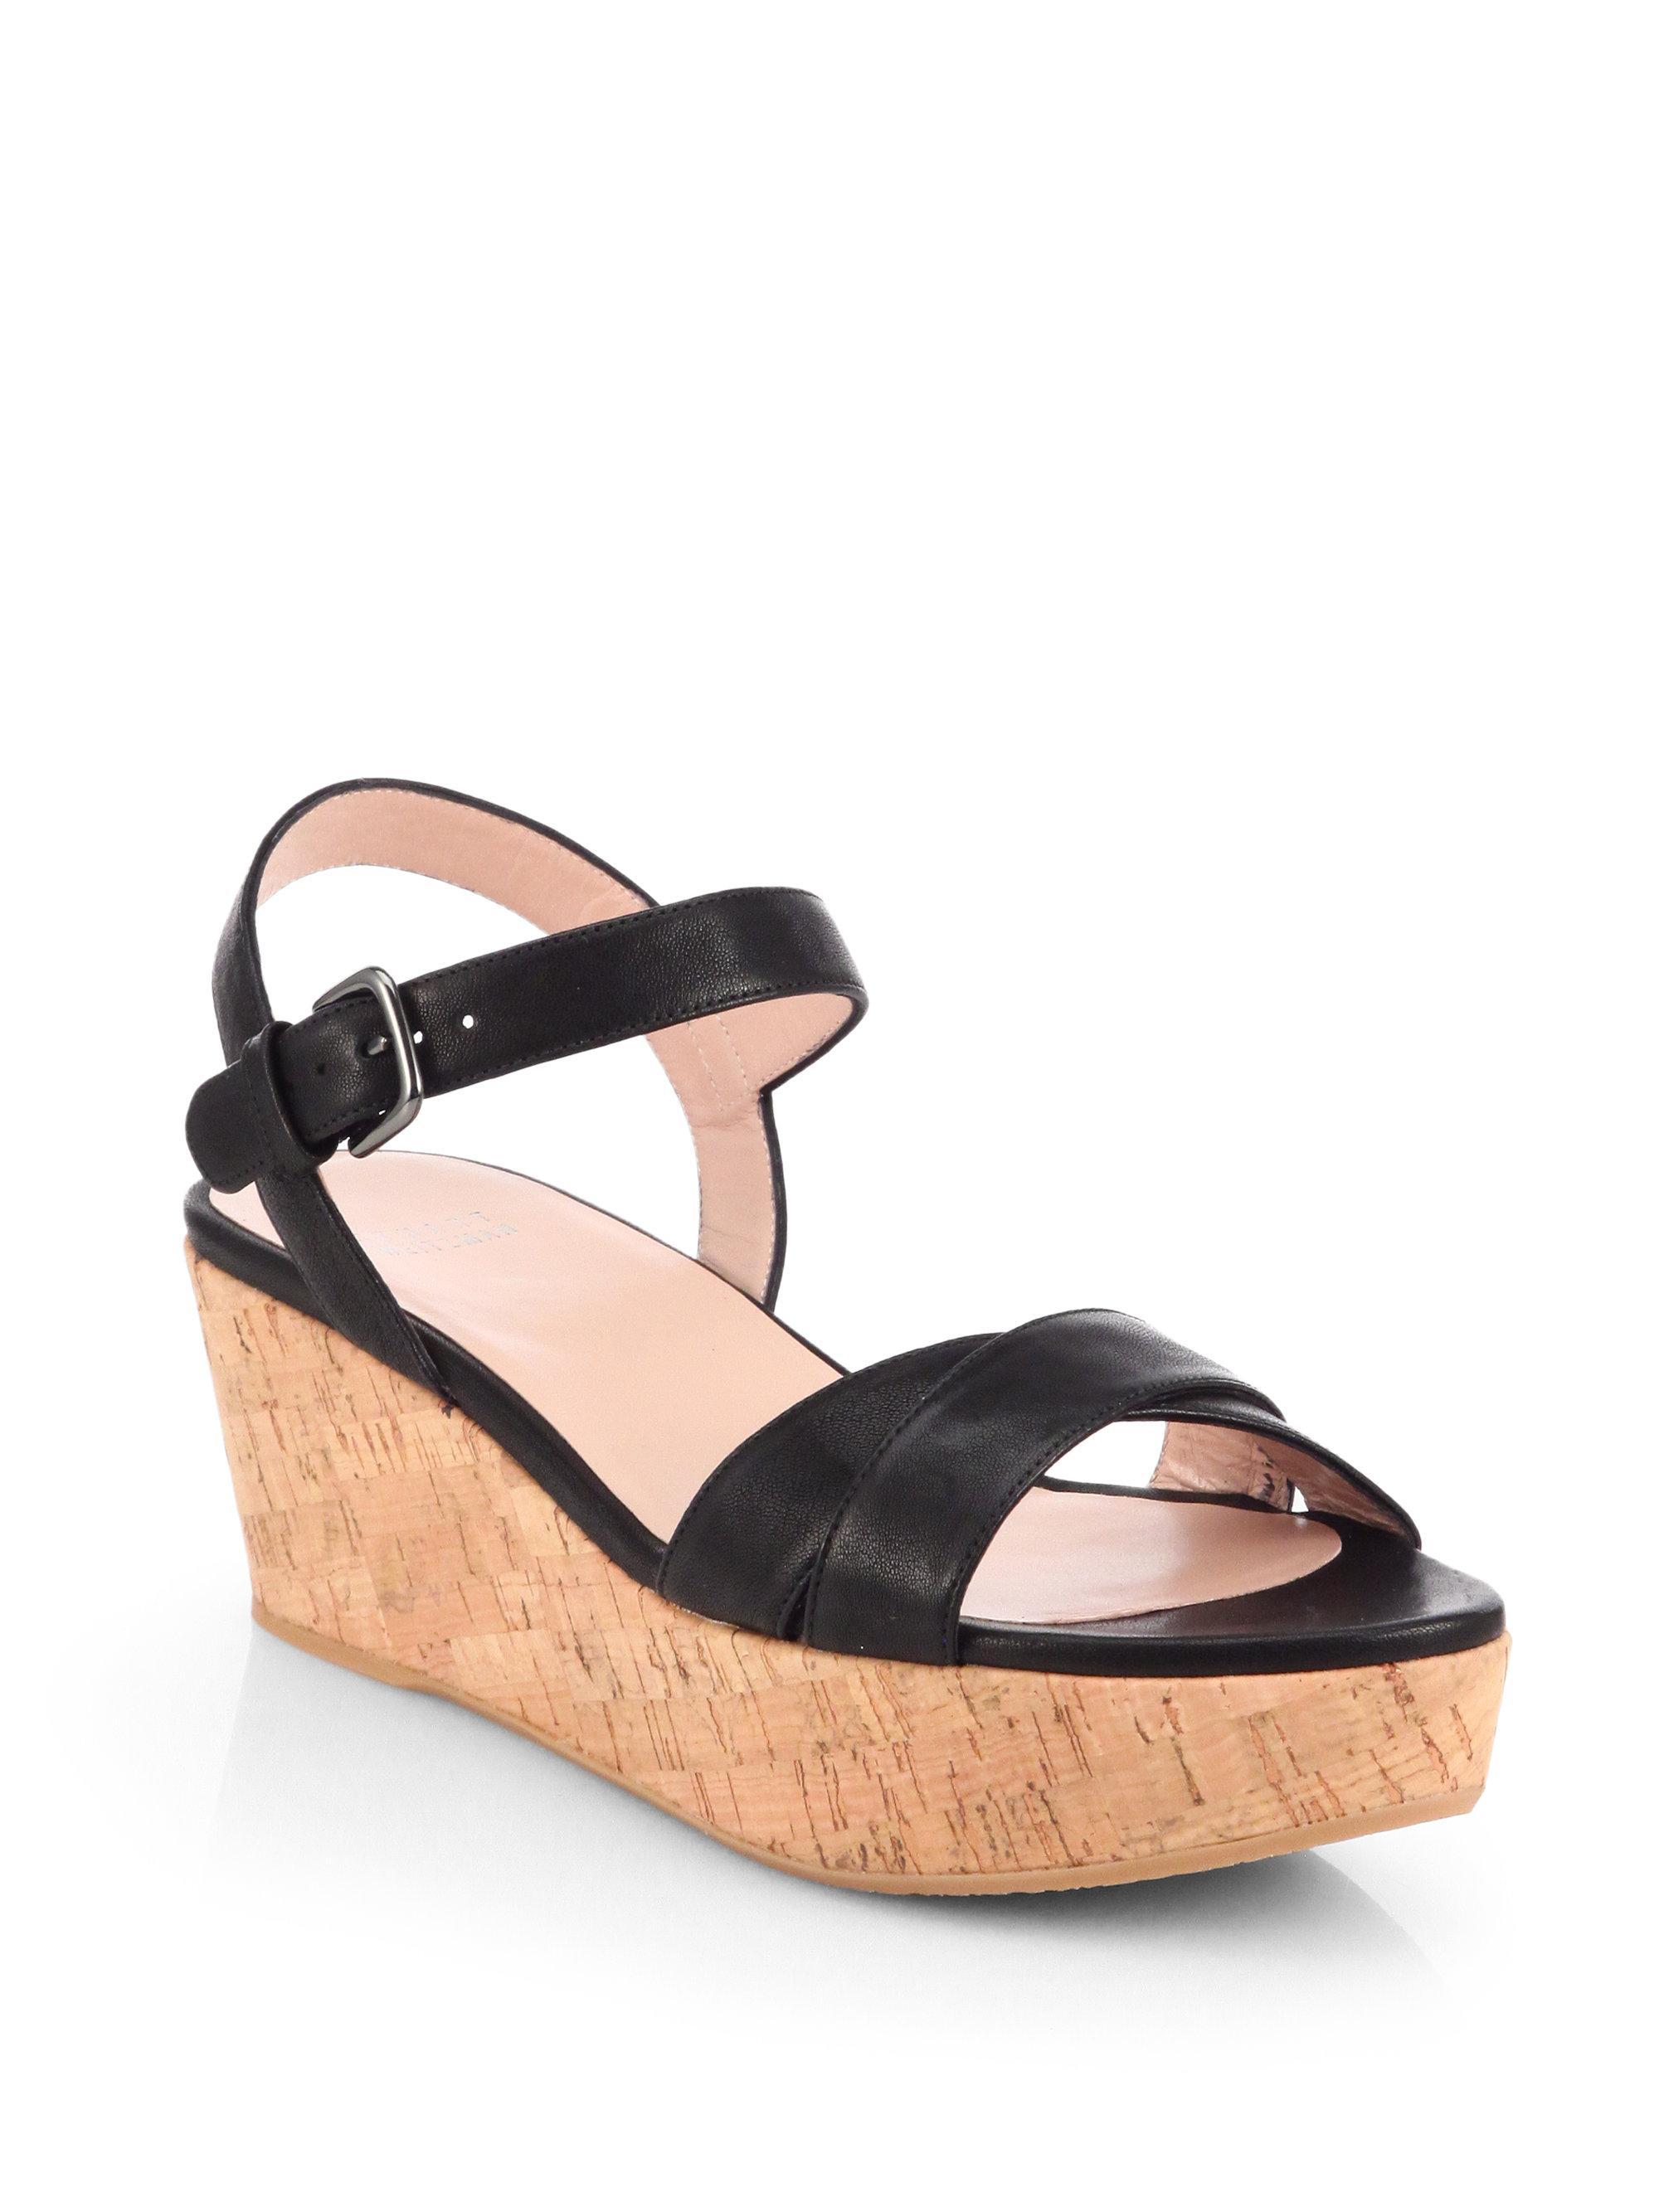 ef0210bcd75 Lyst - Stuart Weitzman Crosson Cork Platform Sandals in Black